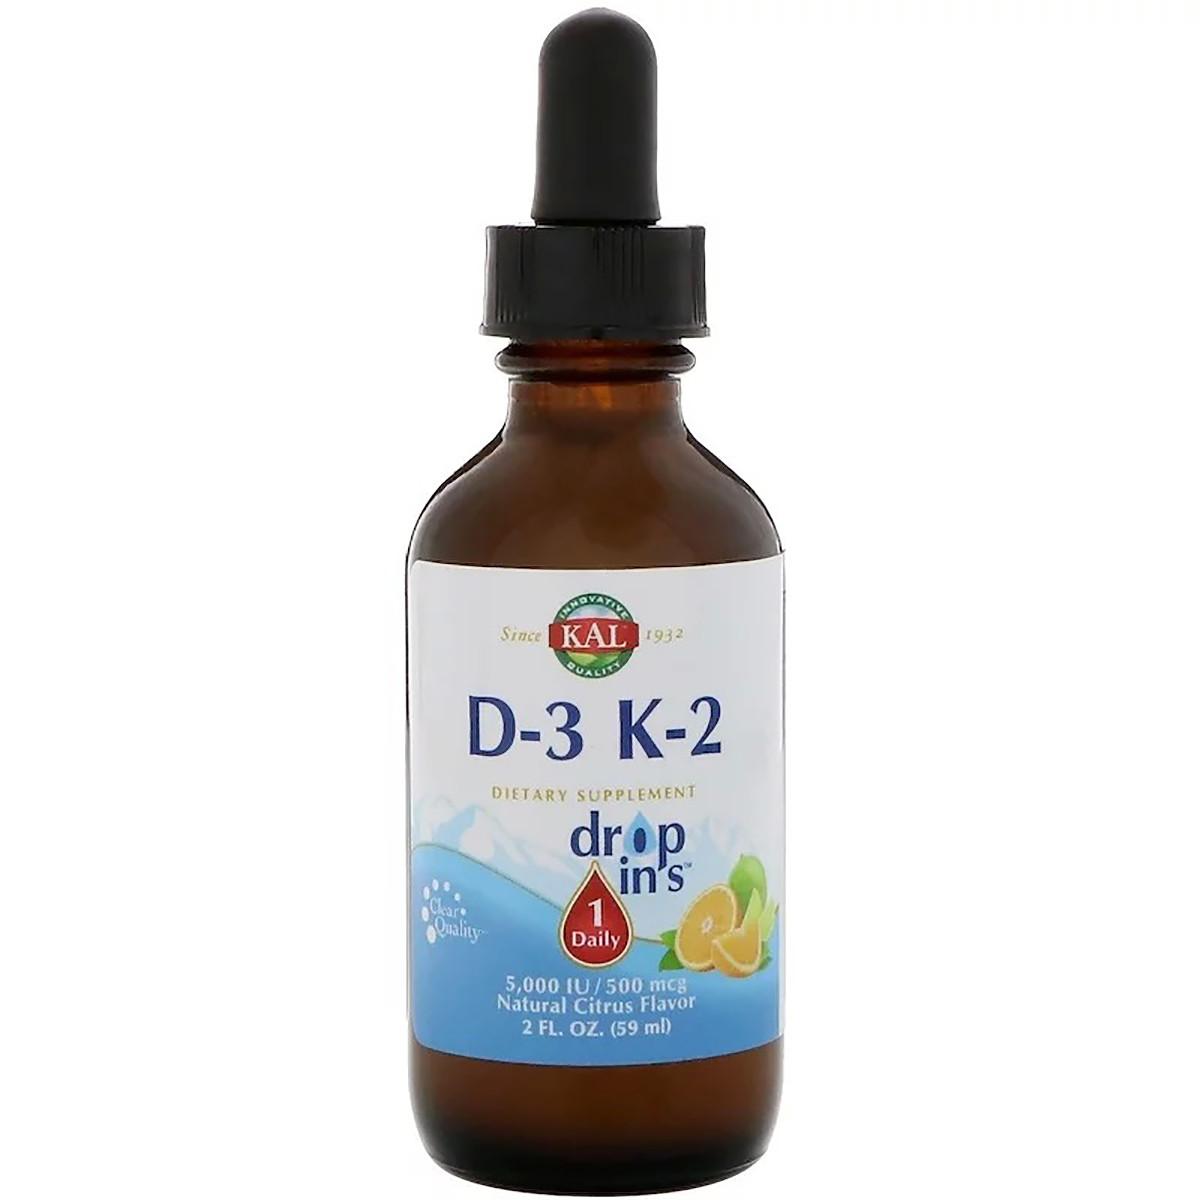 Витамин D3+K2, Vitamin D-3 K-2 Drop, KAL, цитрусовый вкус, 59 мл.